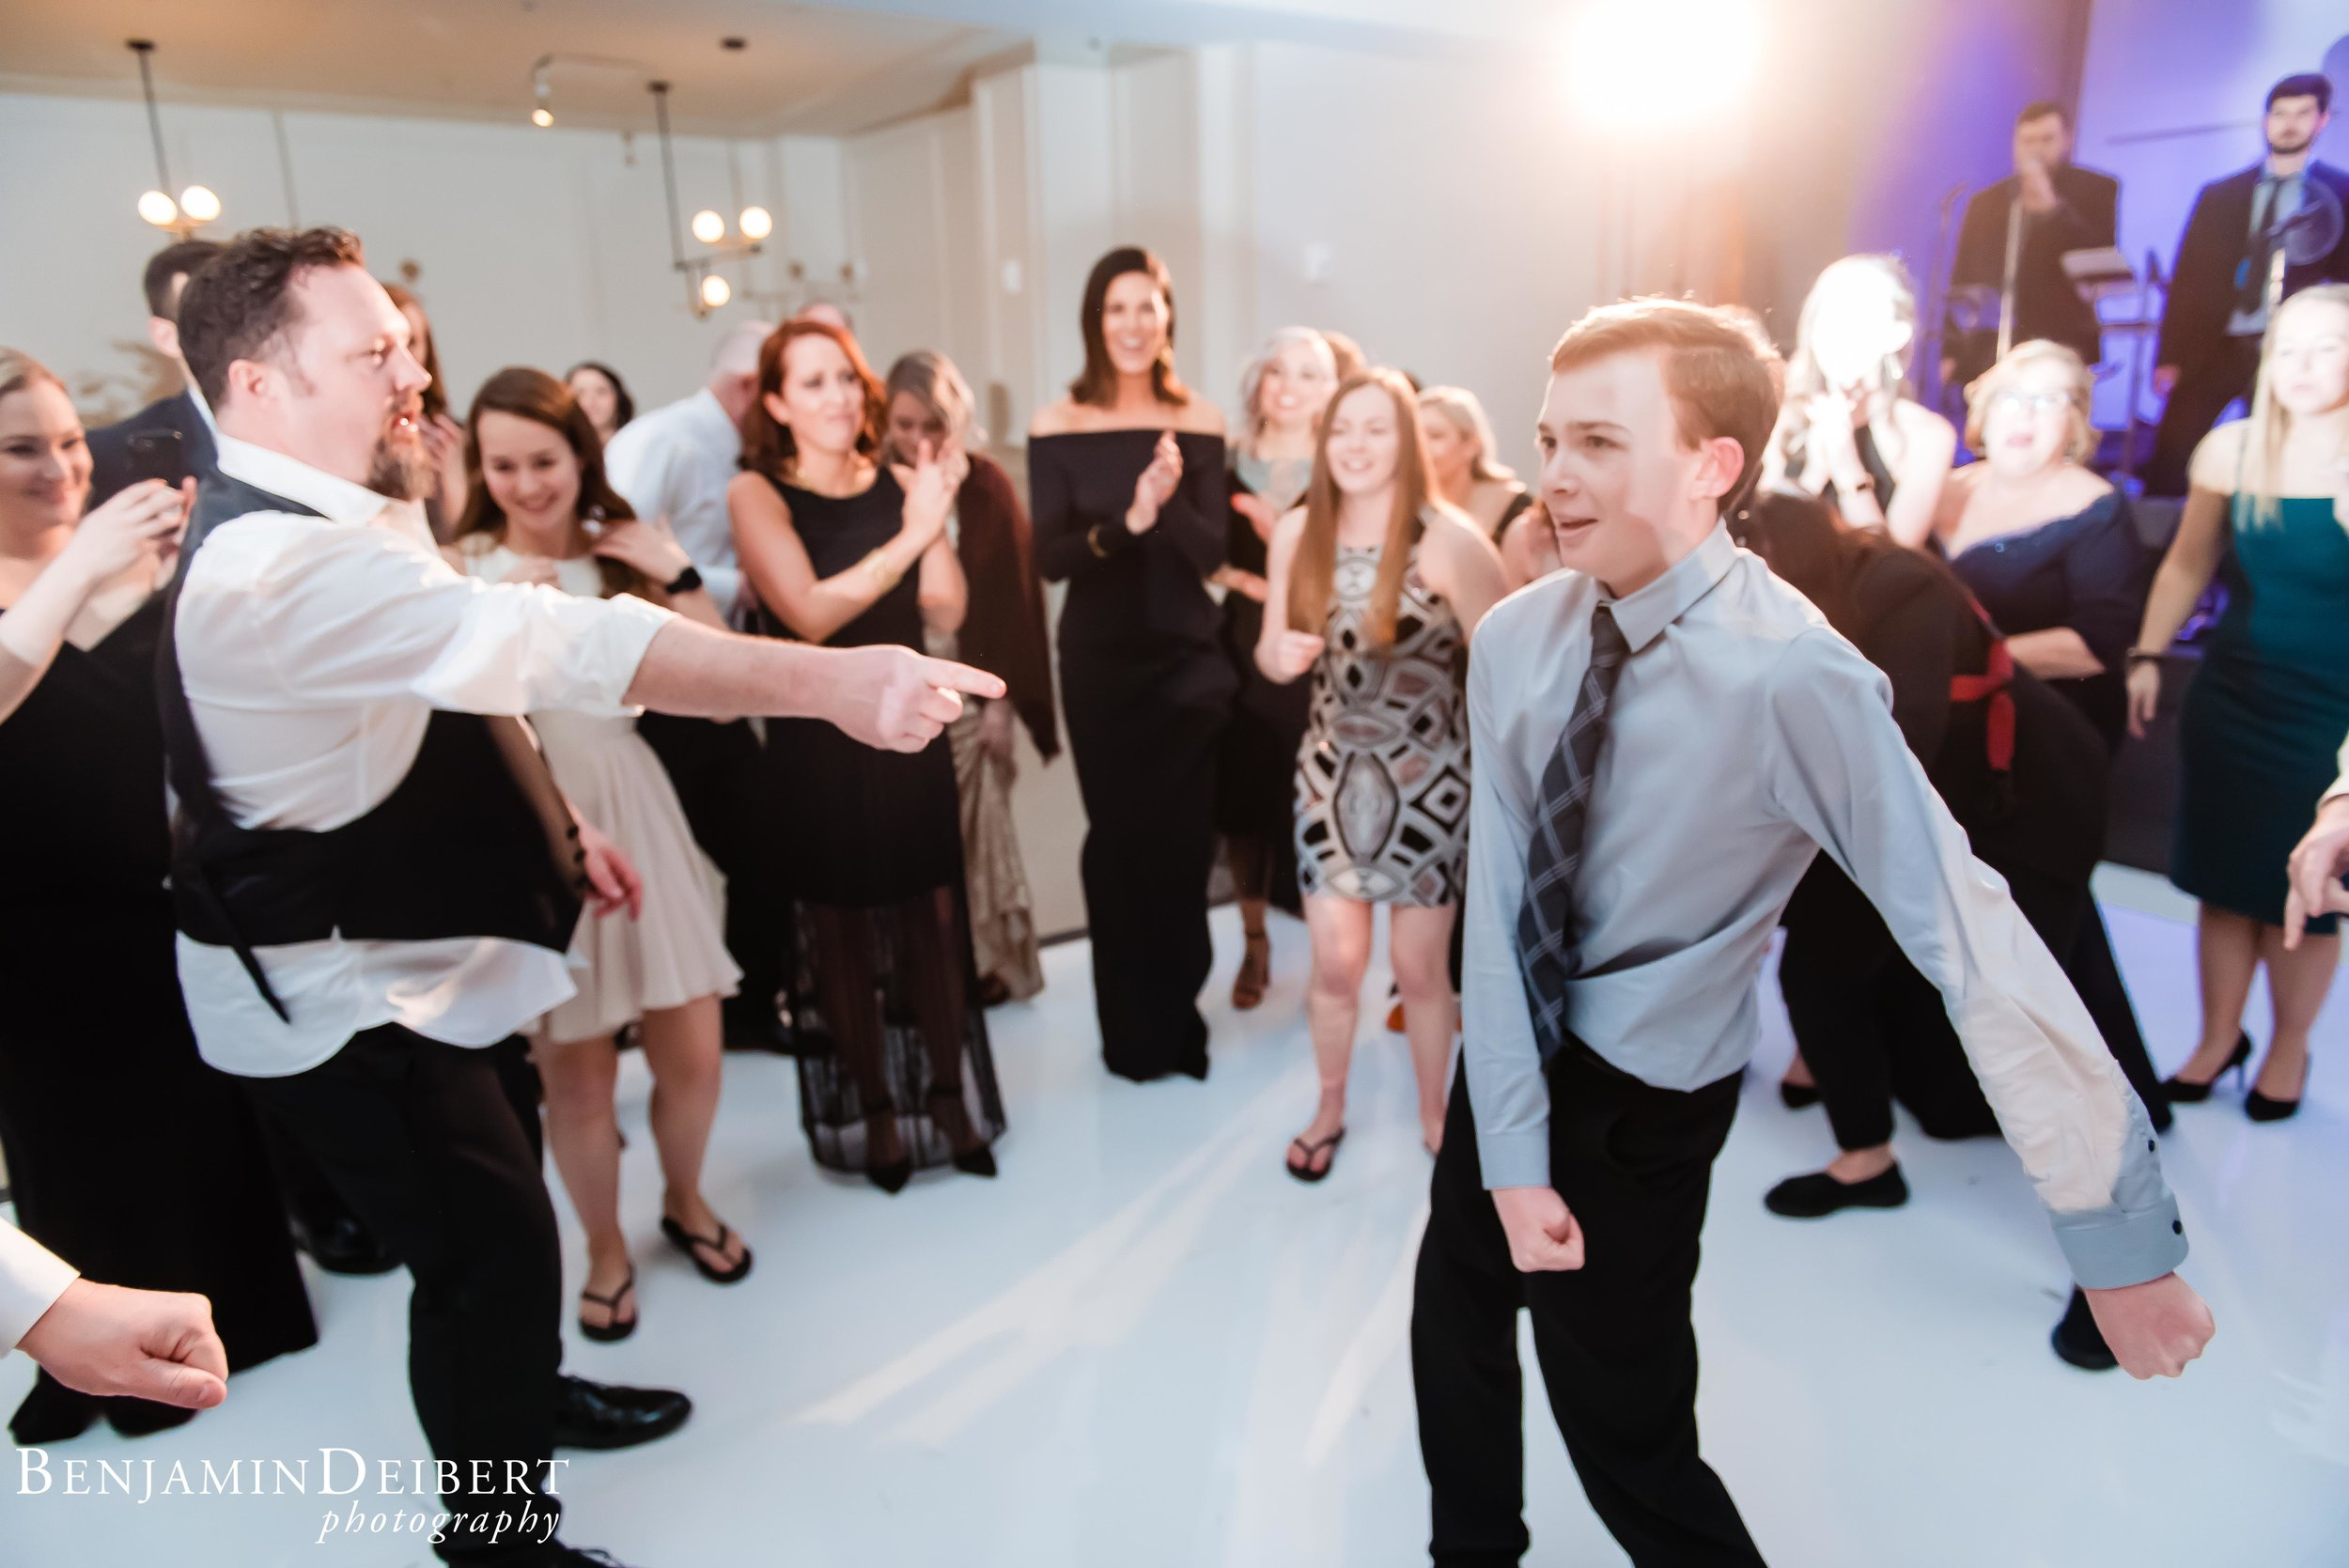 PatriceandAdam_TheLucy__Cescaphe_Wedding-110.jpg